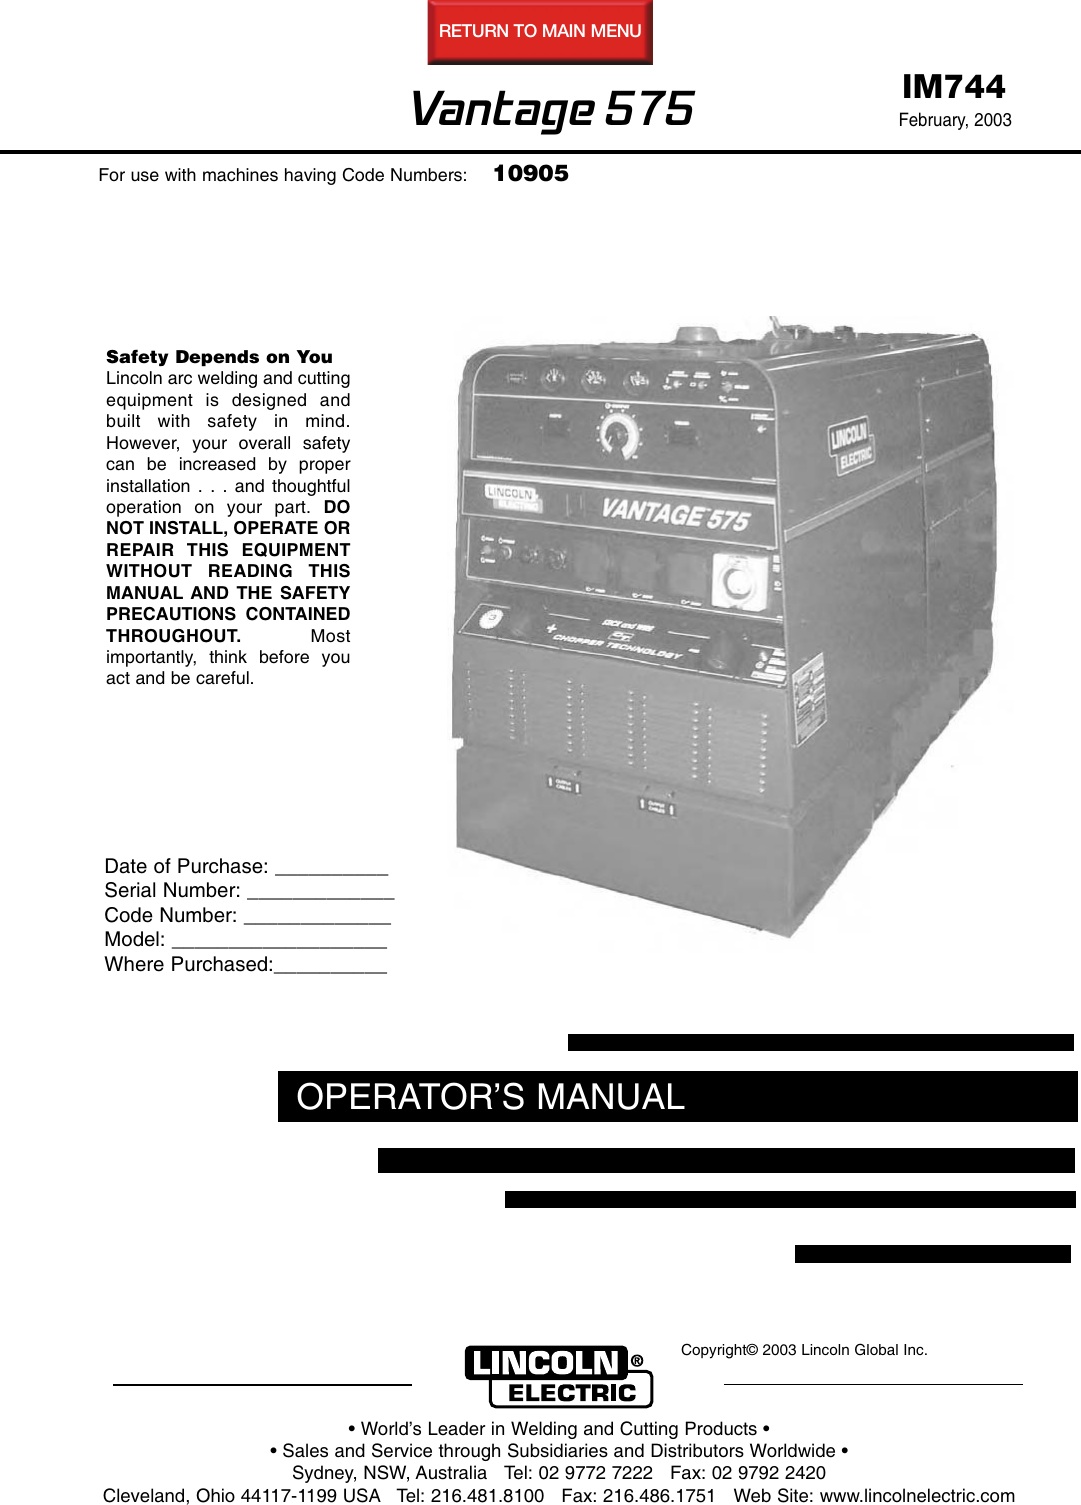 lincoln electric vantage 575 users manual im744  usermanual.wiki